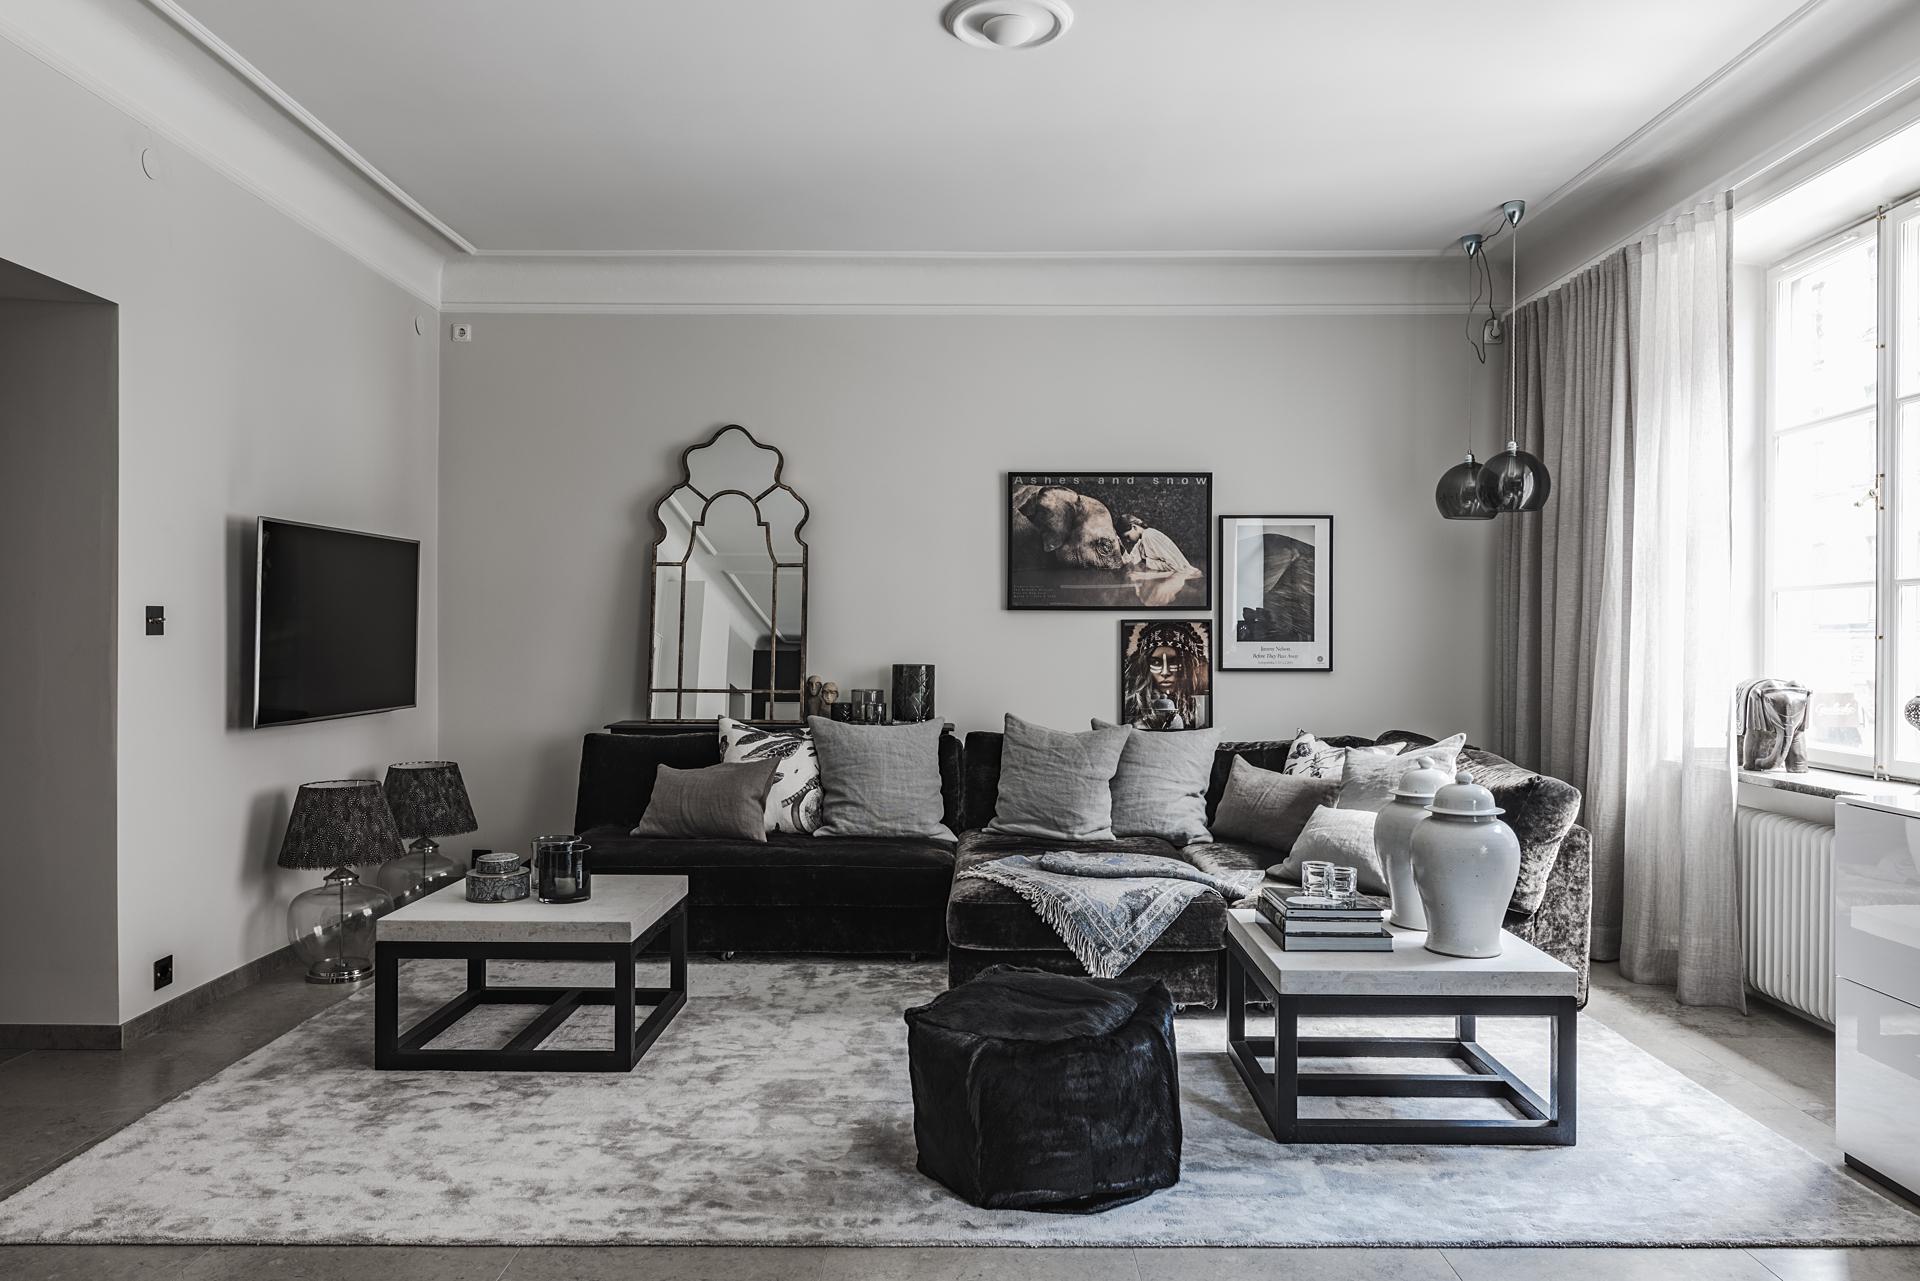 гостиная диван подушки ковер пуф столики